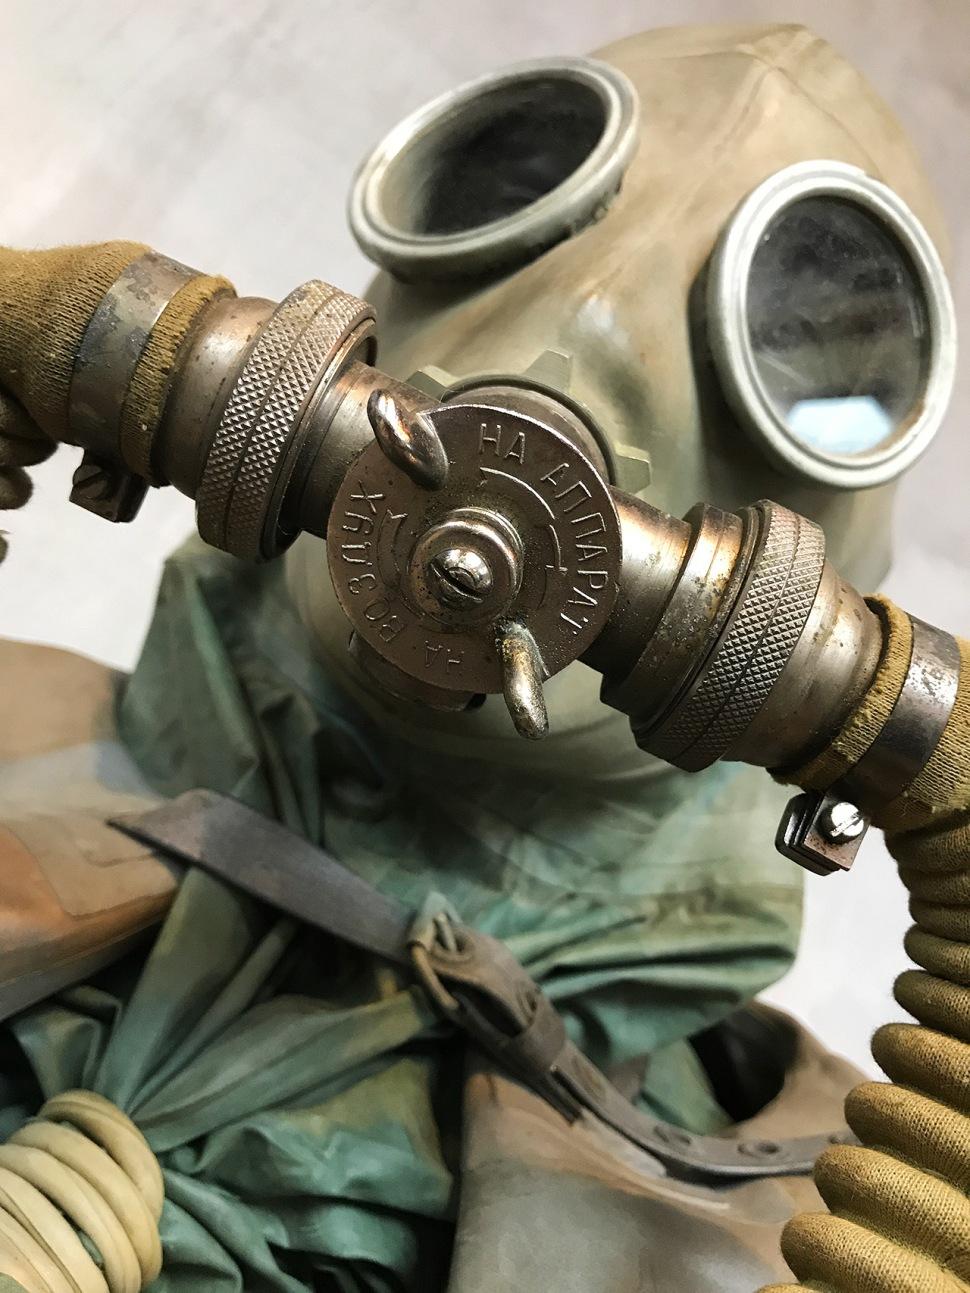 180627-panerai-gtg-moscow-paneristi-club-room-rebreather-IDA-57-mouth-piece